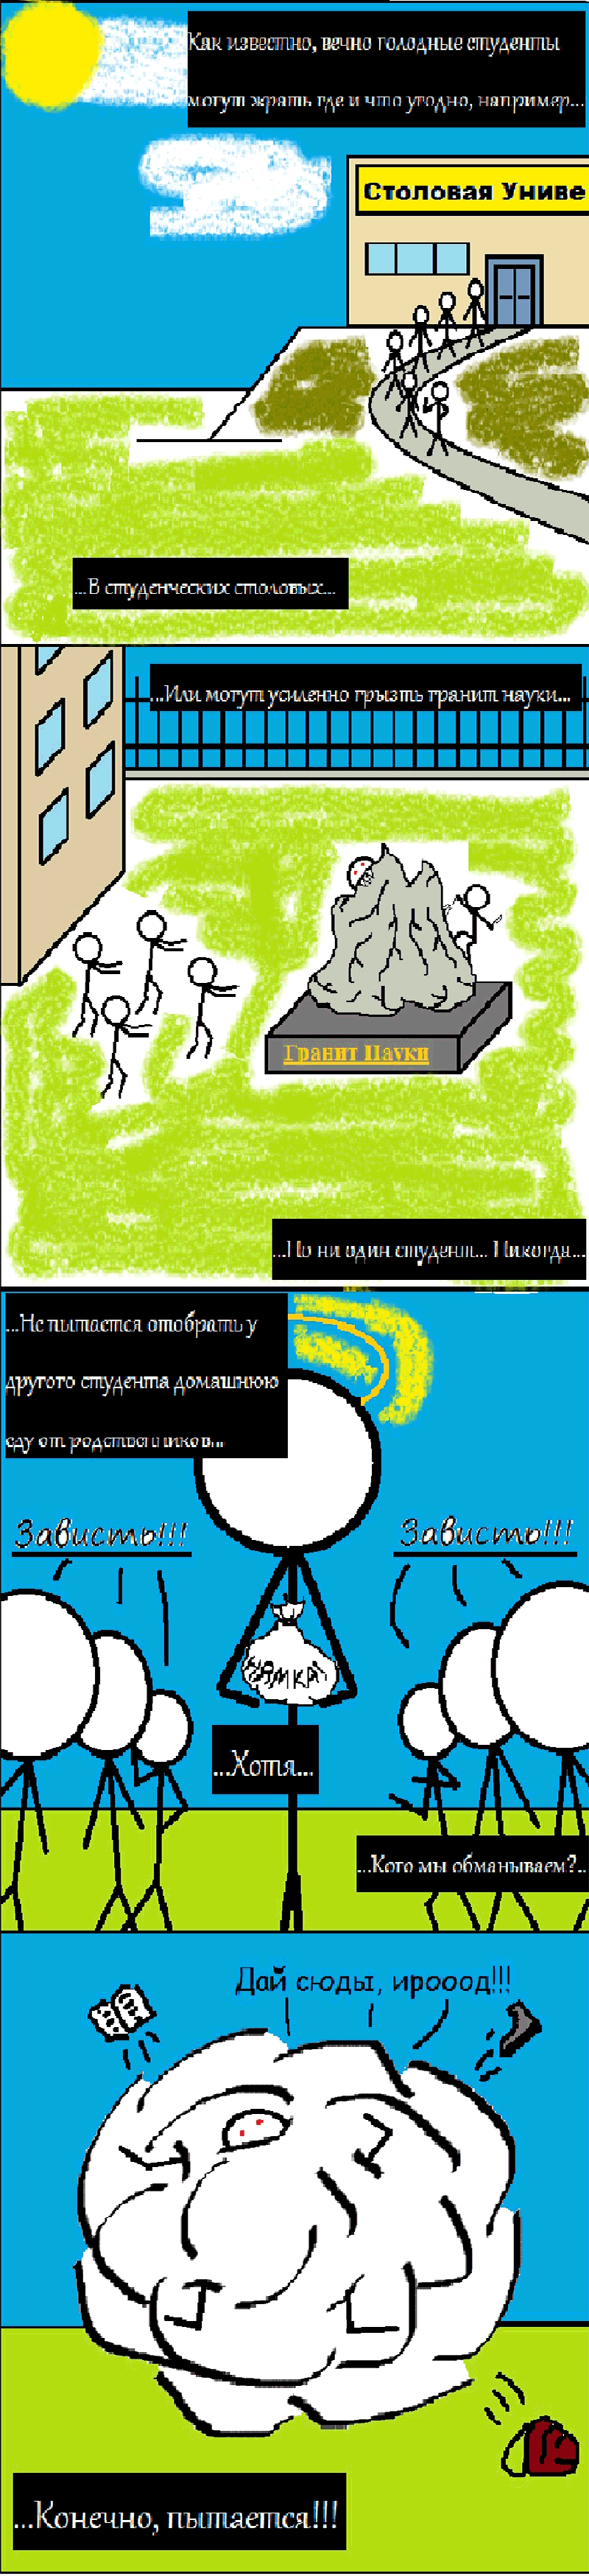 Комикс битва №16 выпуск 48